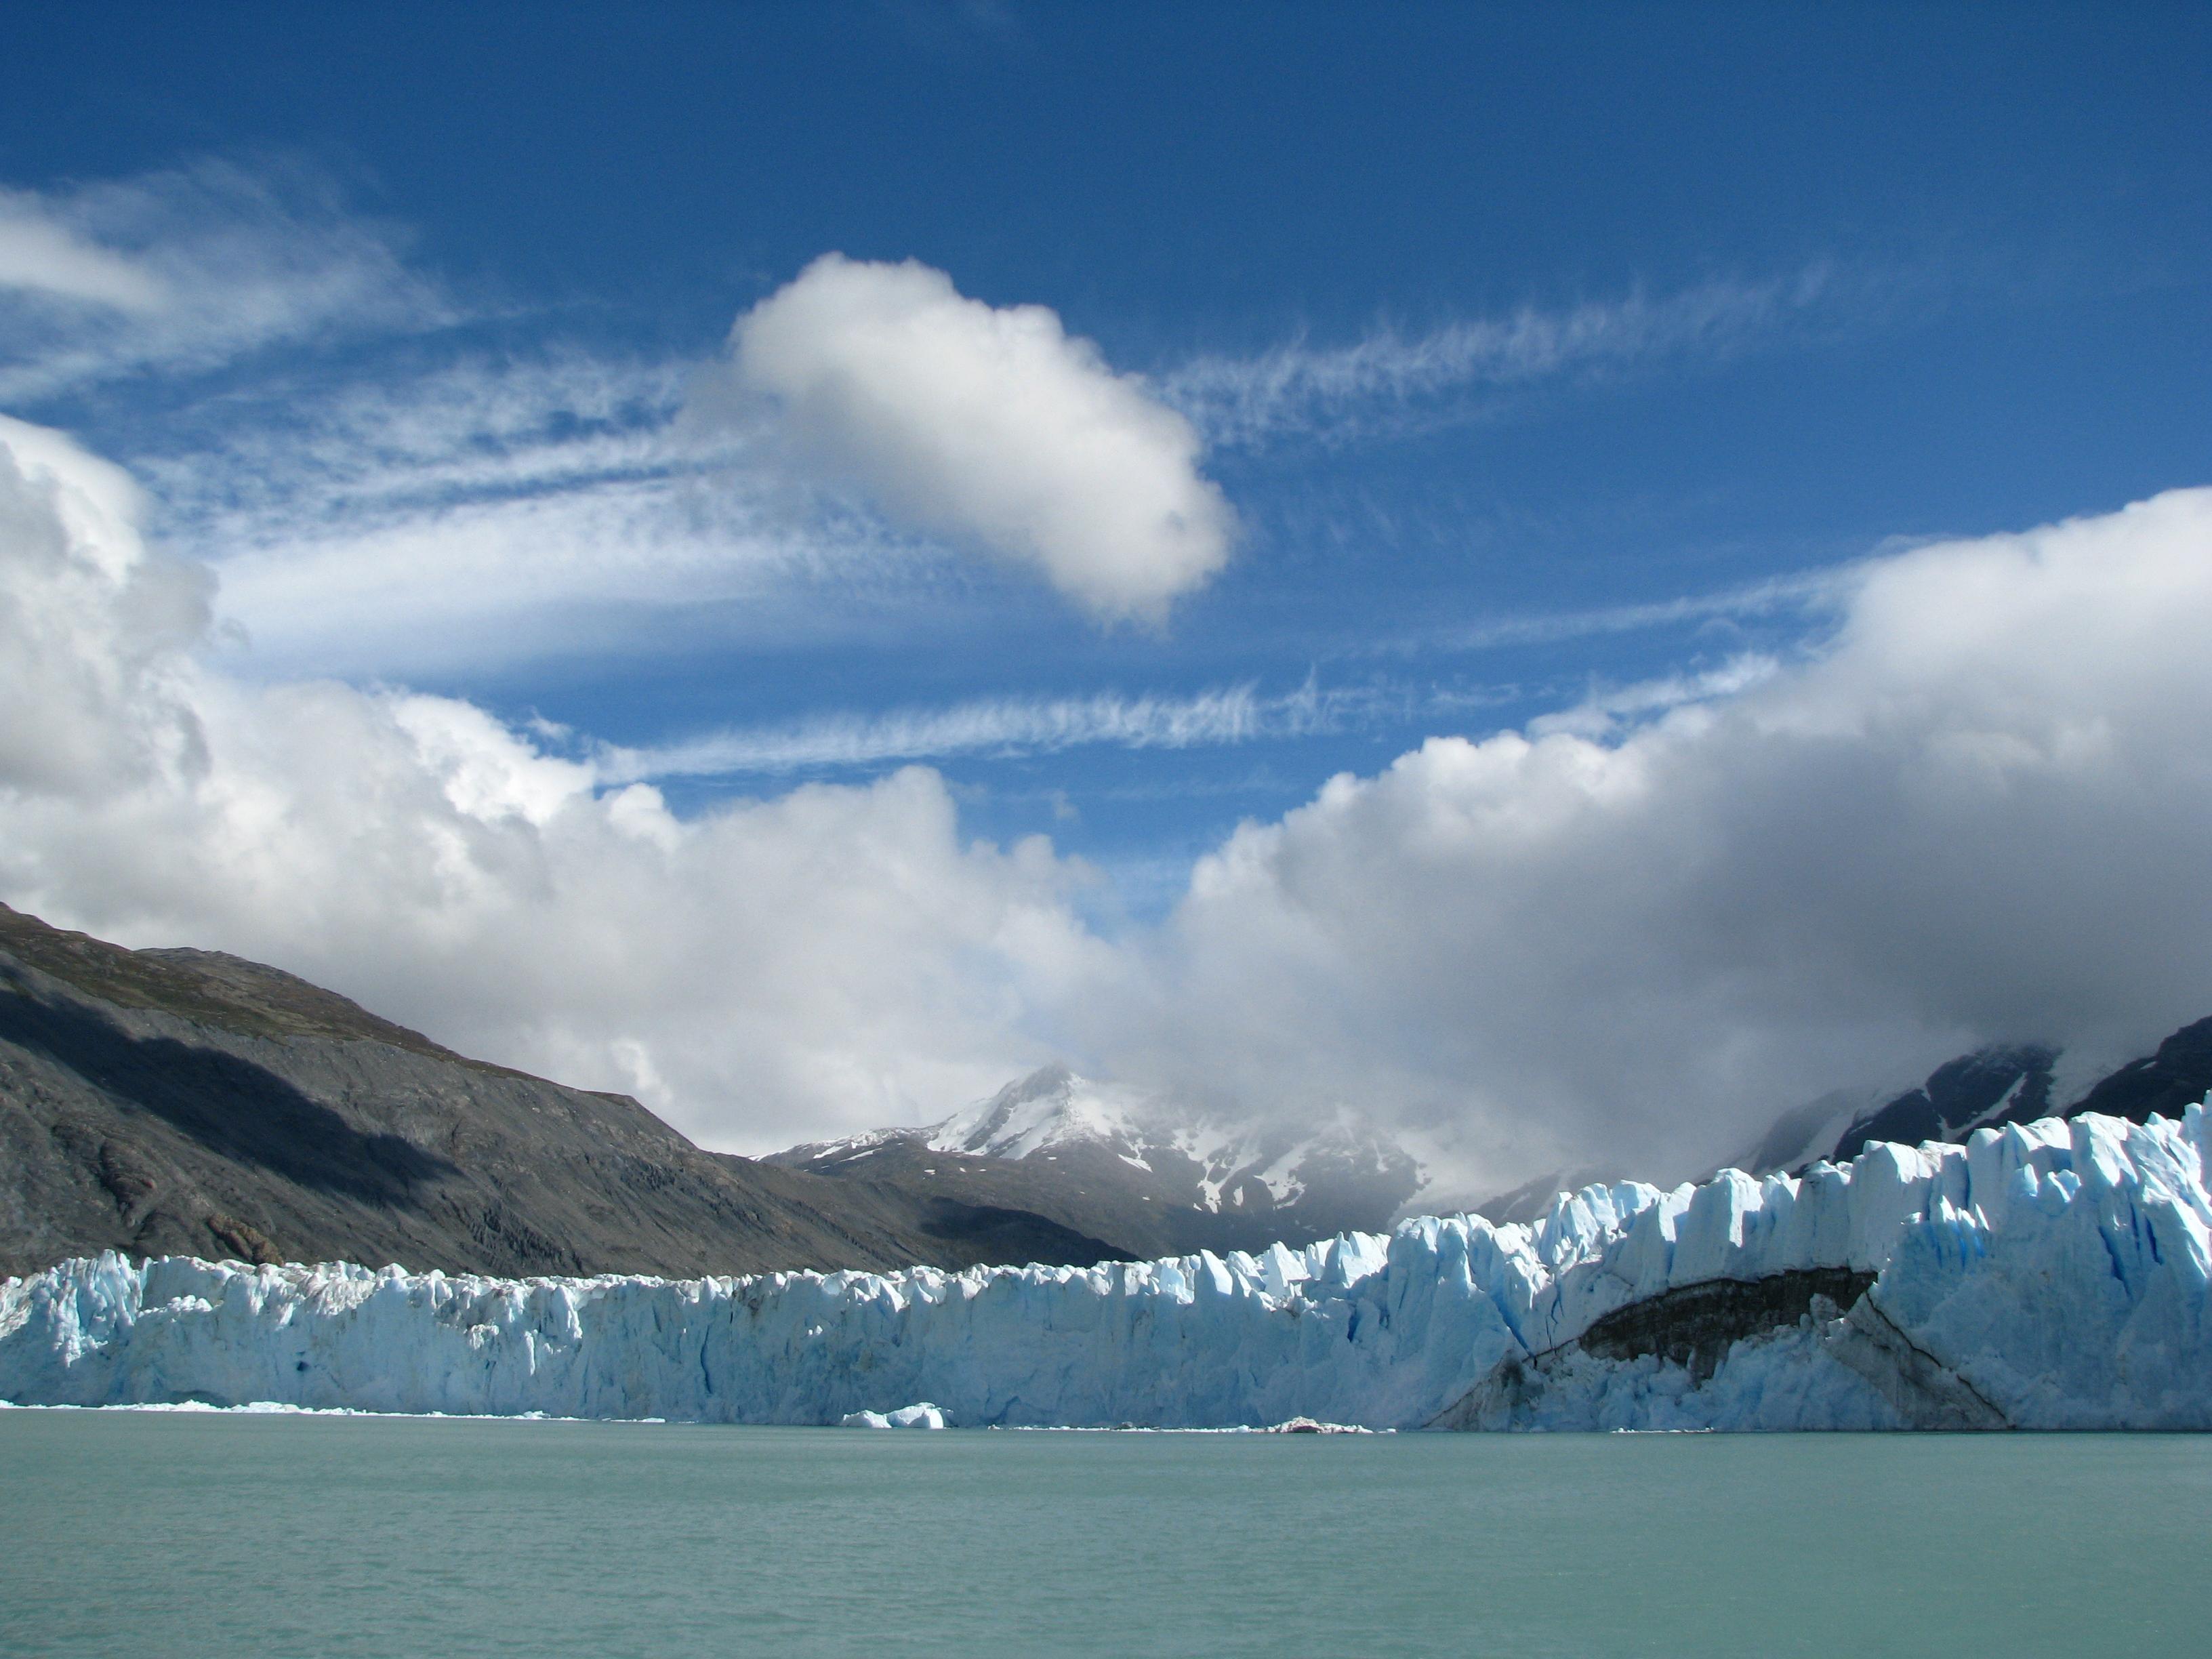 Viaje a la Patagonia Chilena - Glaciar O'Higgins